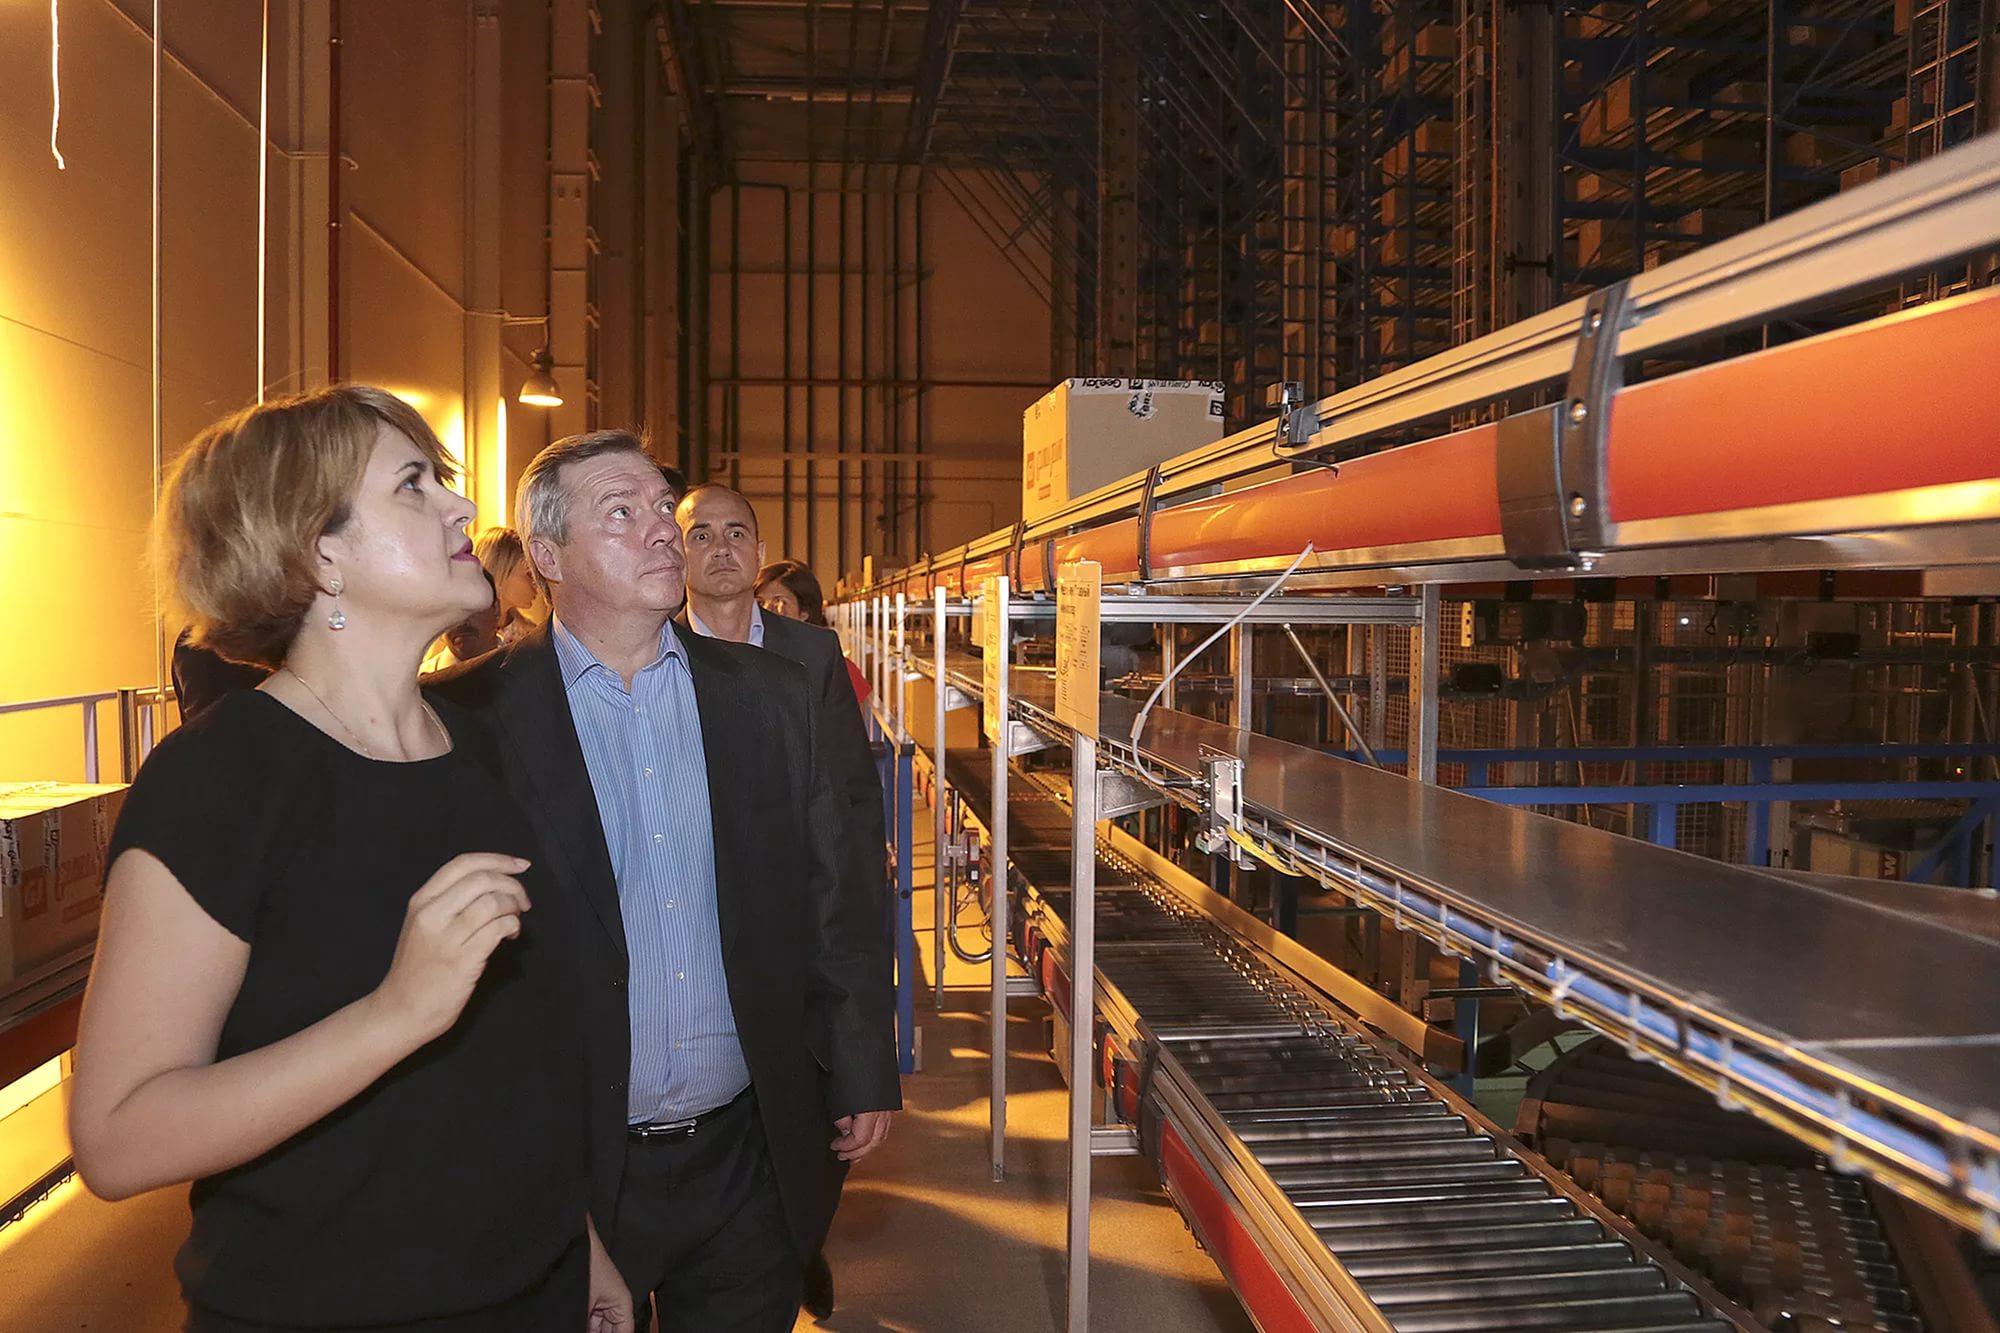 Встроительство центра «Глории Джинс» вШахтах вложат 20 млрд руб.